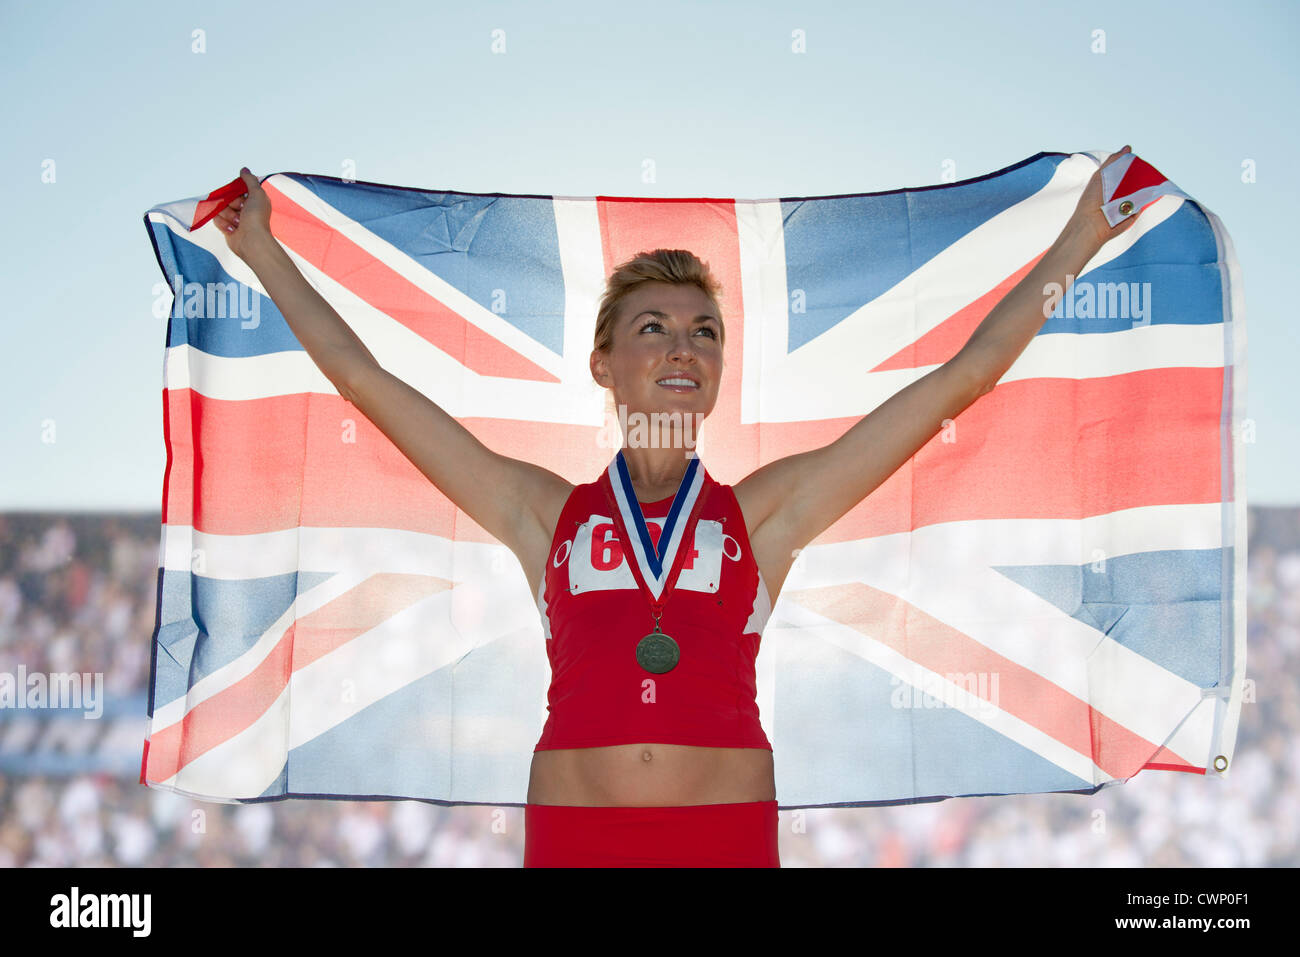 Young female medalist holding up British flag - Stock Image